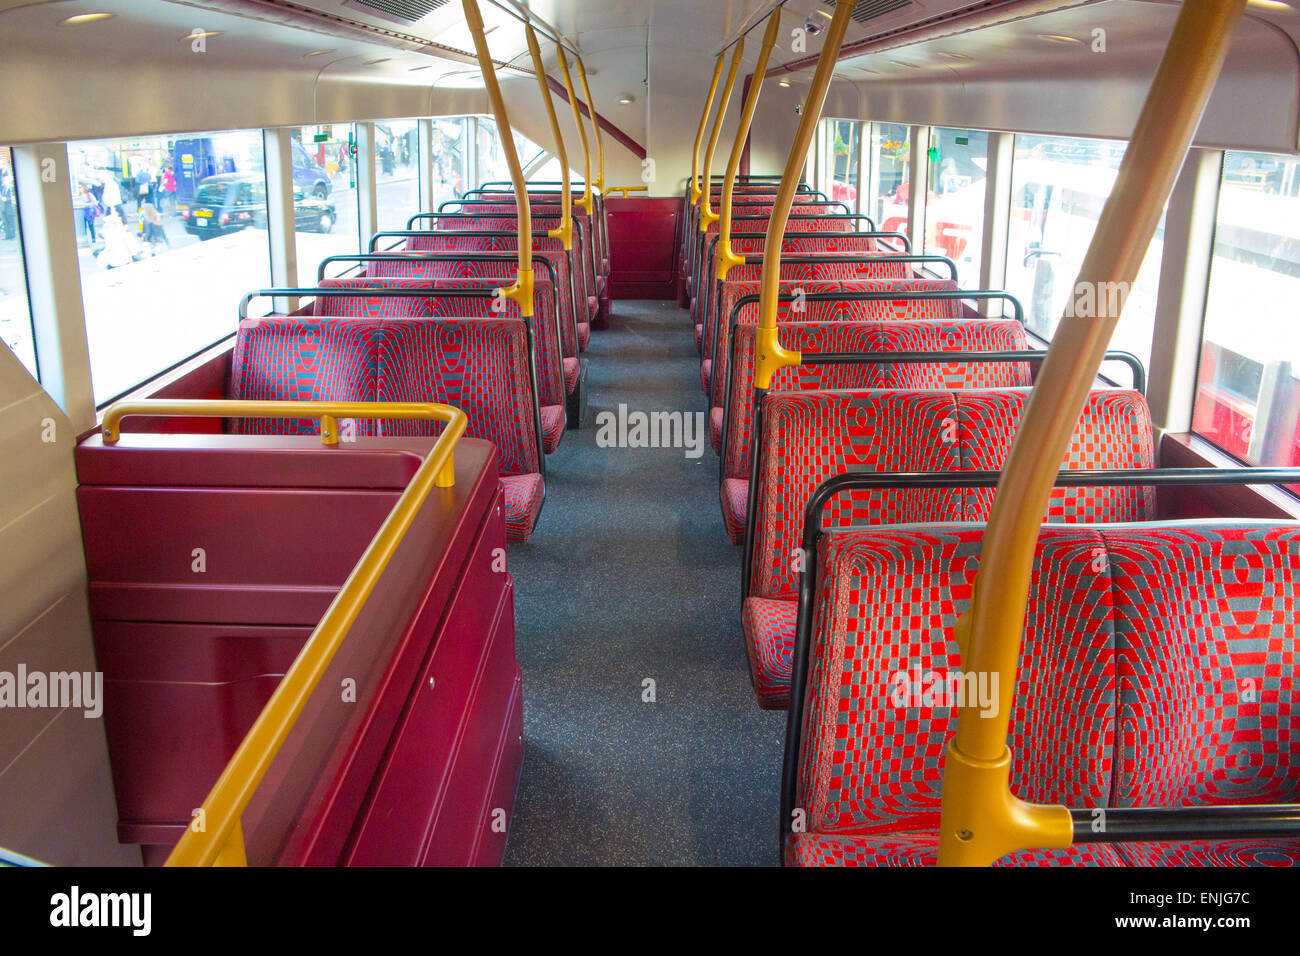 new london routemaster double decker interior Stock Photo: 82157136 ...